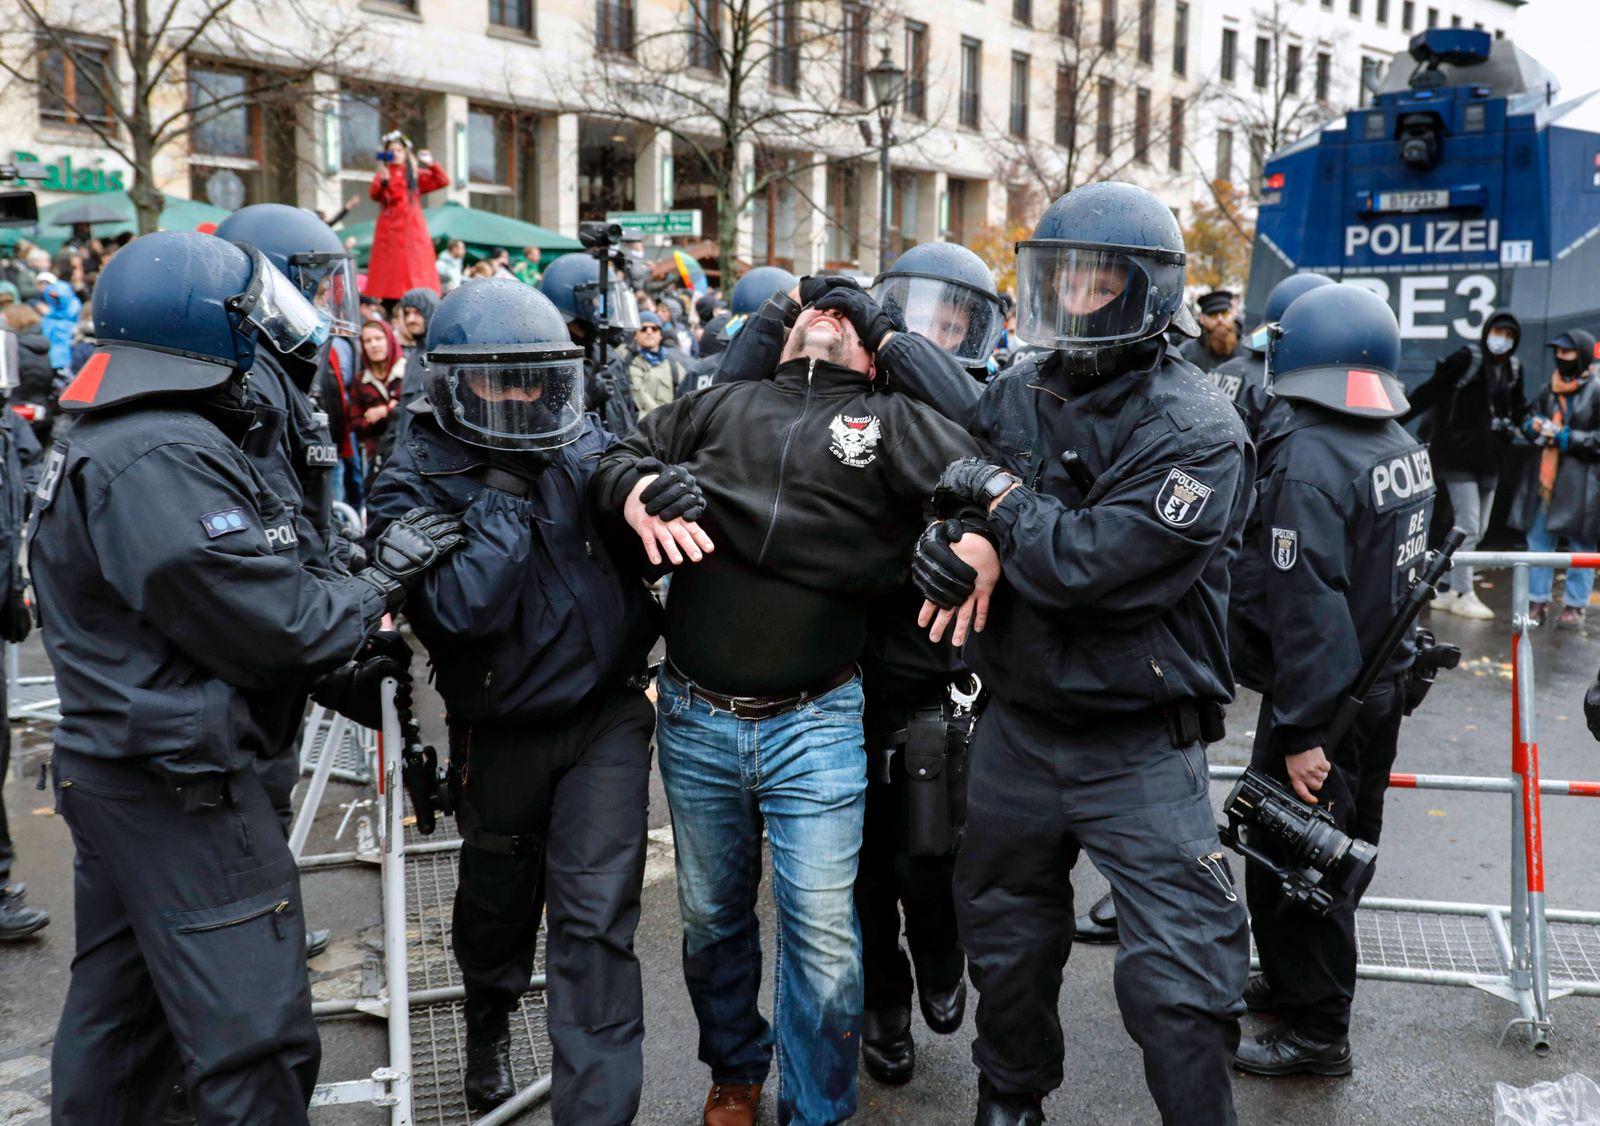 Demonstration Gegner der Corona Maßnahmen Berlin, DEU, 18.04.2020 - Festnahme eines Demonstranten waherend einer Corona